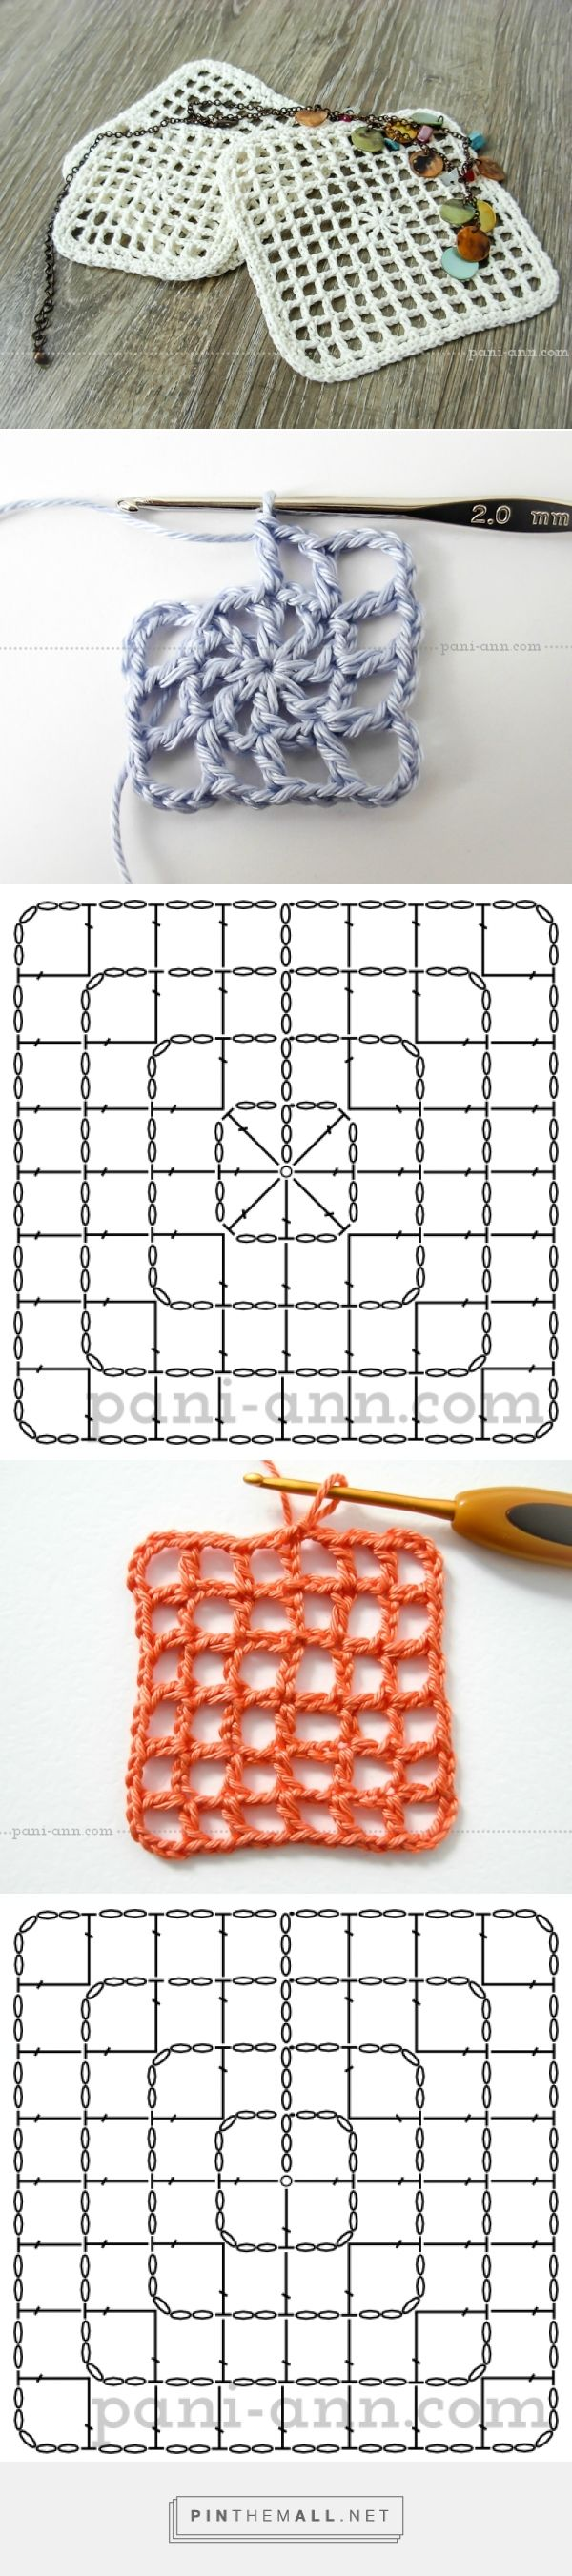 Kissenbezug häkeln Rückseite - big granny crochet - filet crochet in the round to create square - picture tutorial on site